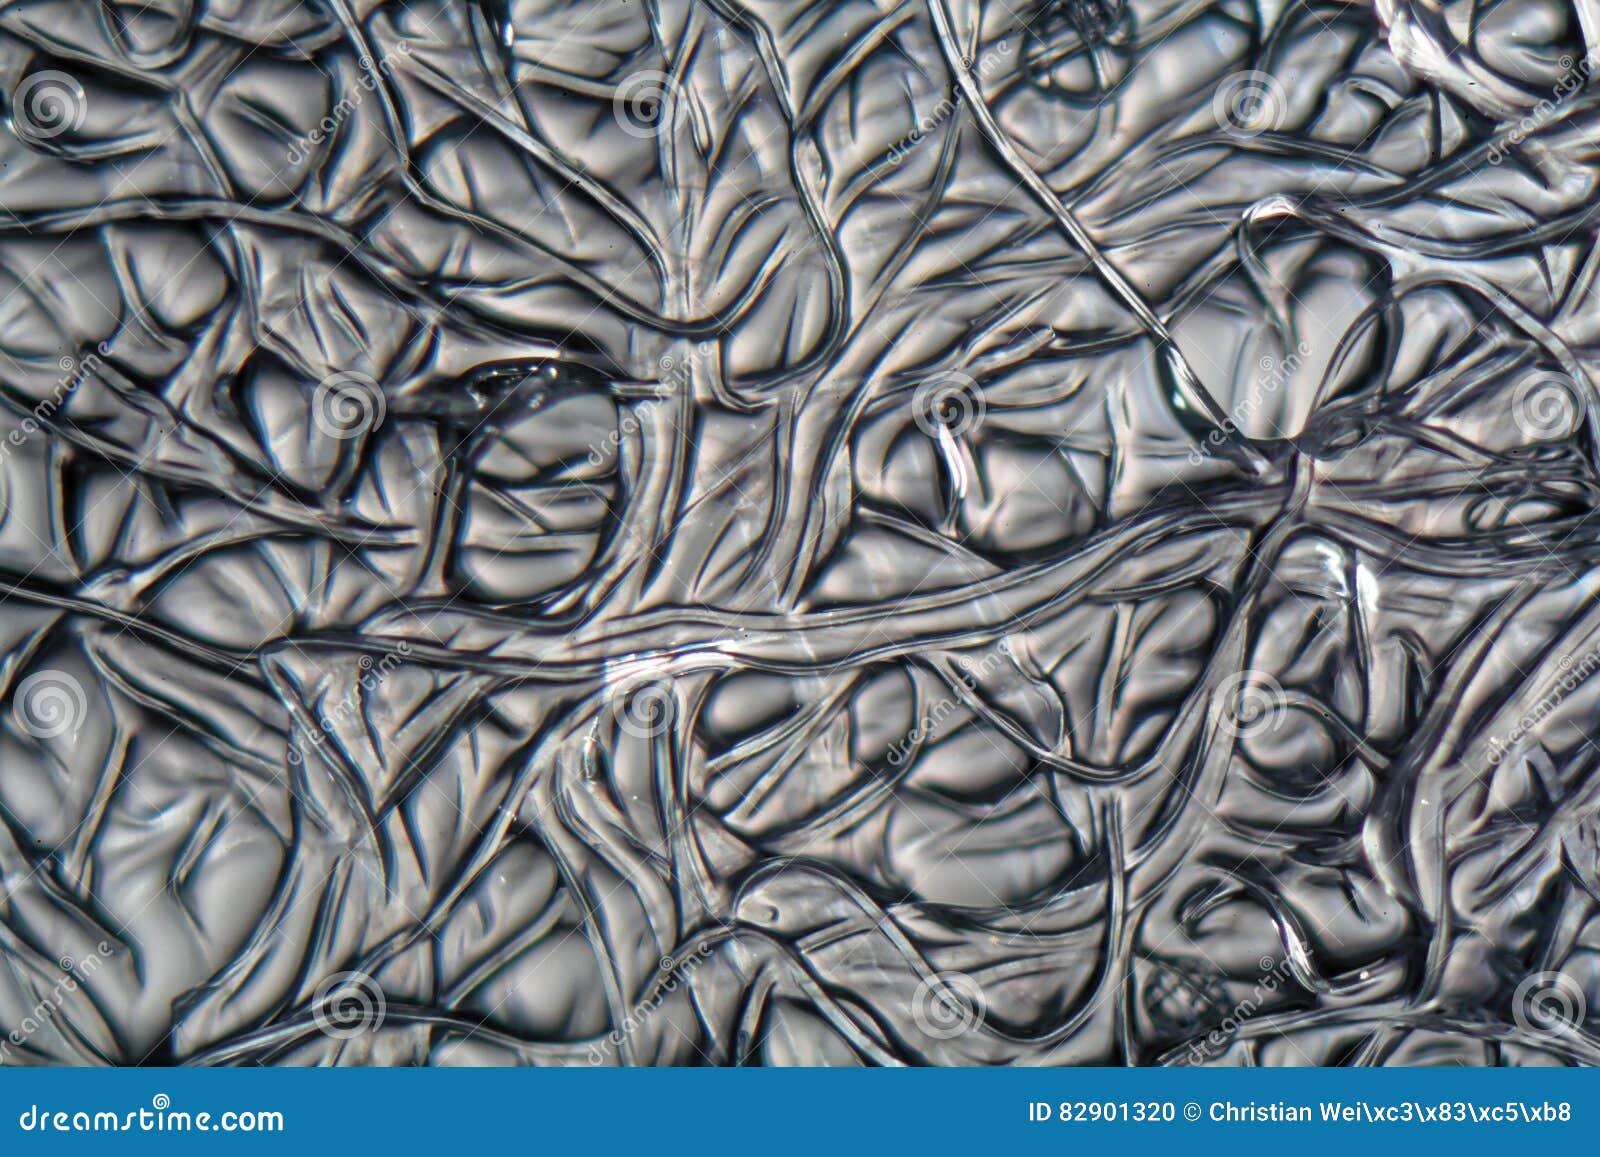 Fibers of Cellulose acetate under the microscope.